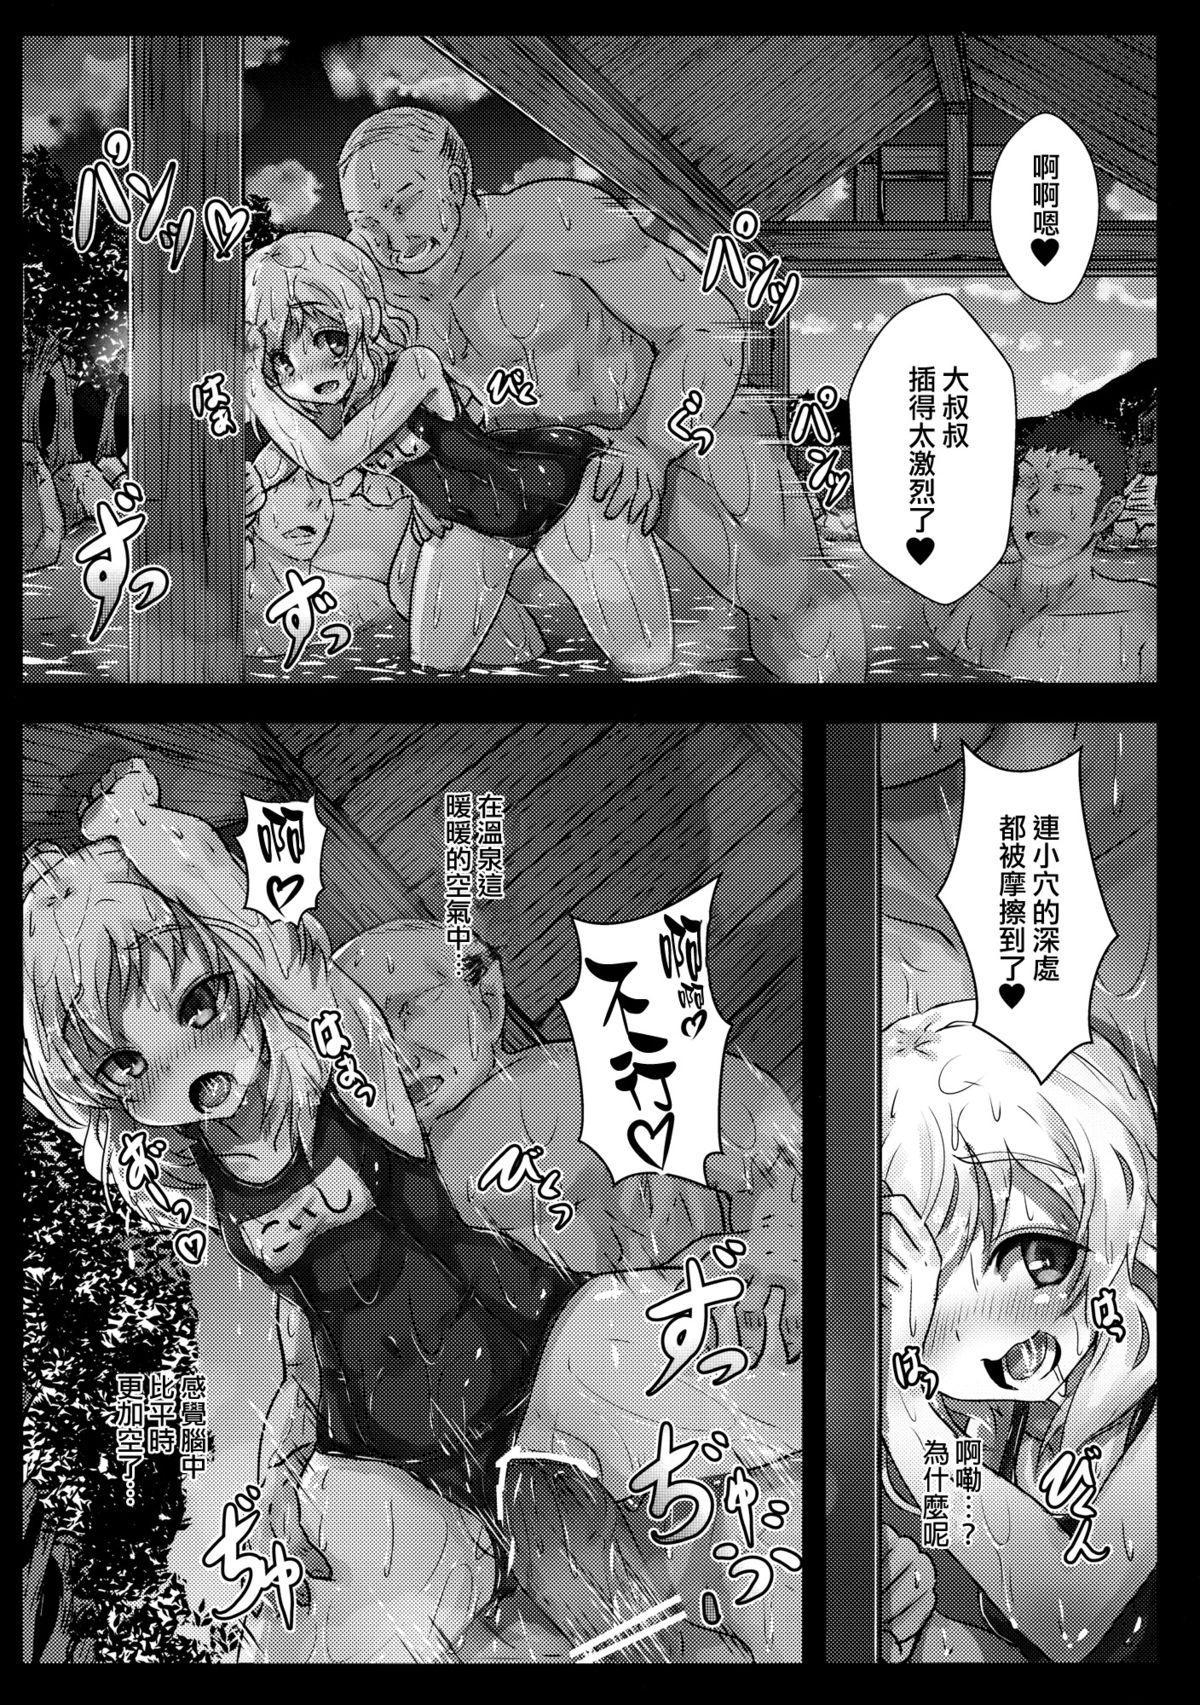 Koishi-chan no Ecchi na Mainichi 13